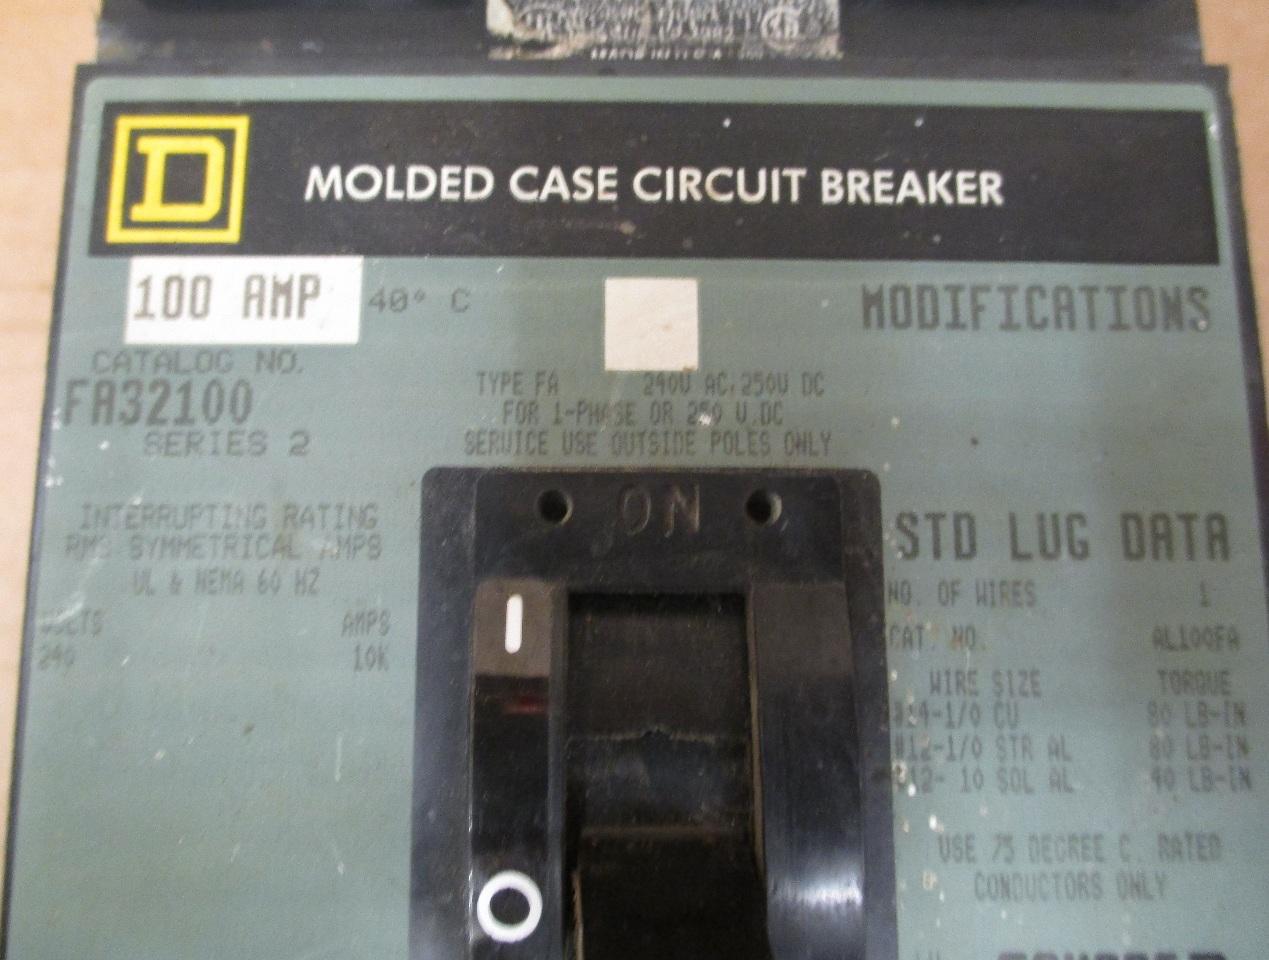 Square D FA32100 3 pole 100 AMP Circuit Breaker Series 2 | Daves ...